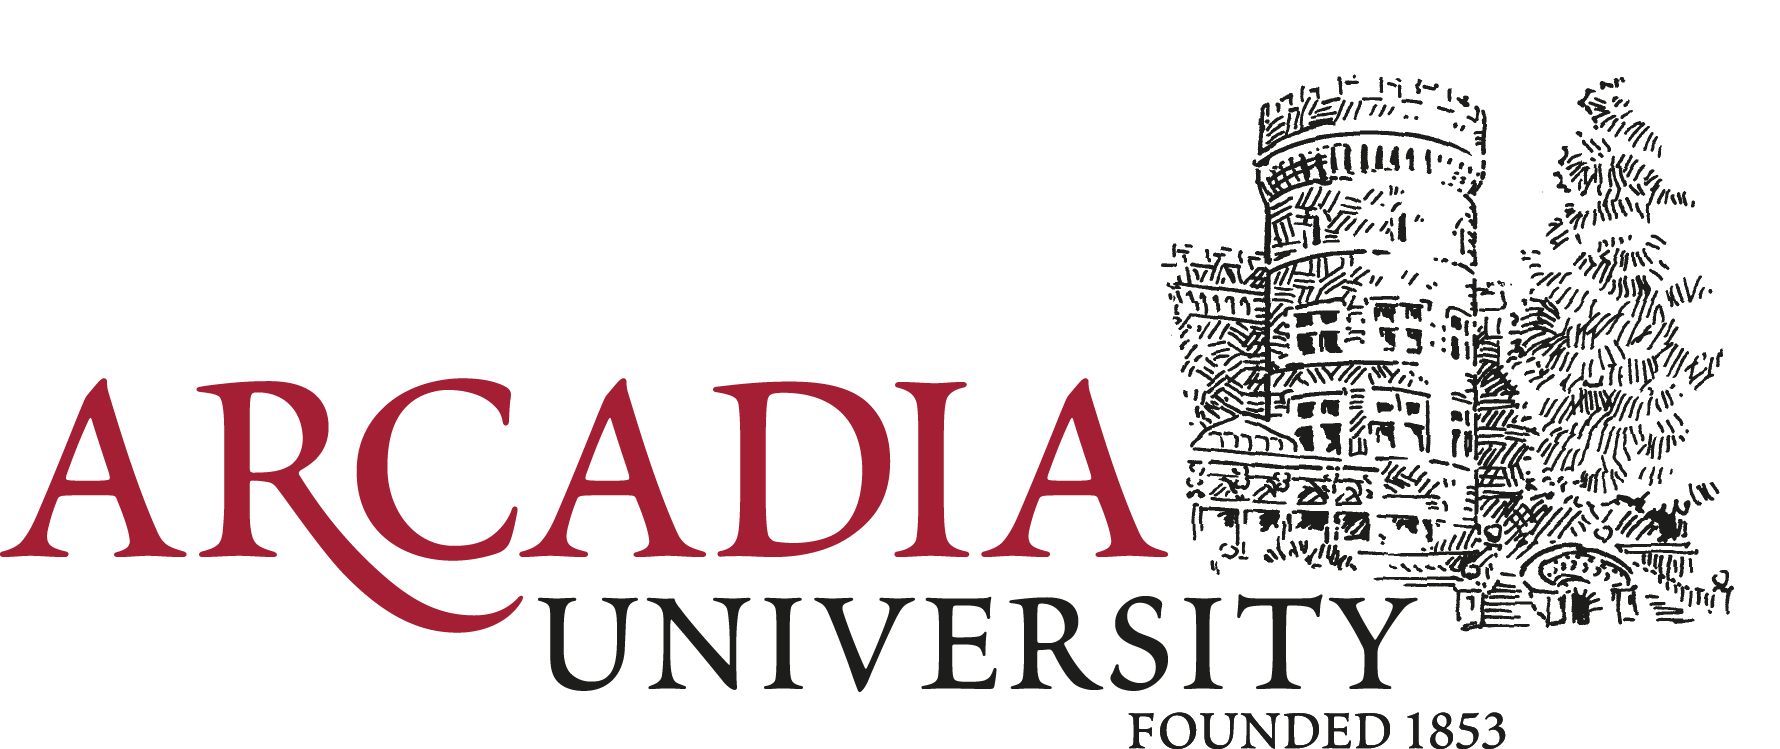 Arcadia University Logo [arcadia.edu] Download Vector.